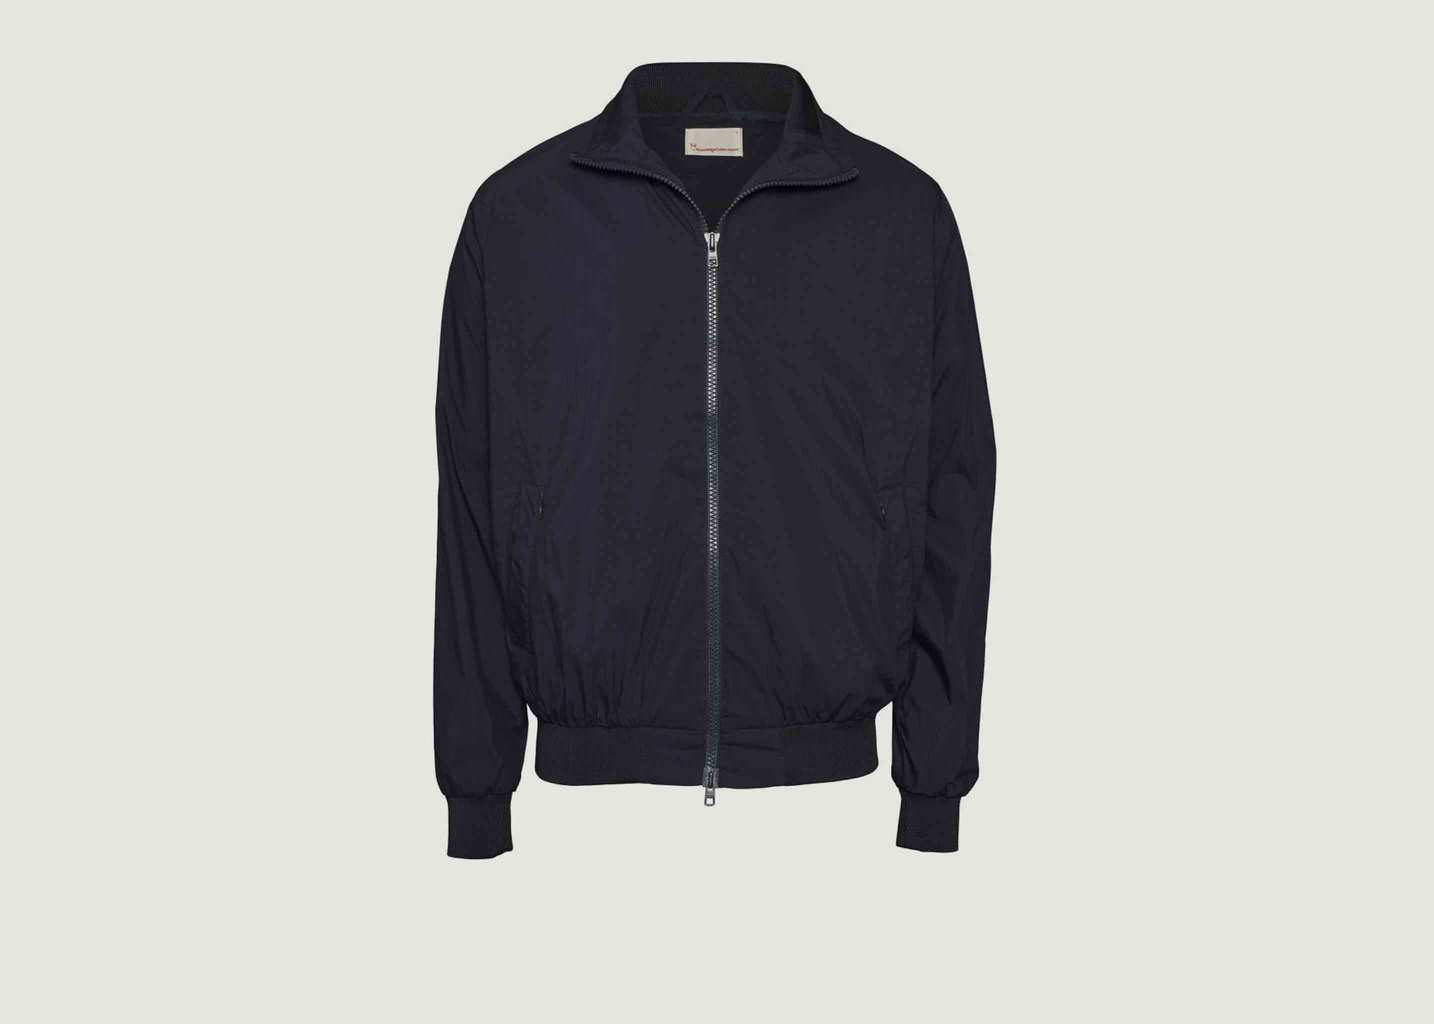 Nylon Jacket - Knowledge Cotton Apparel